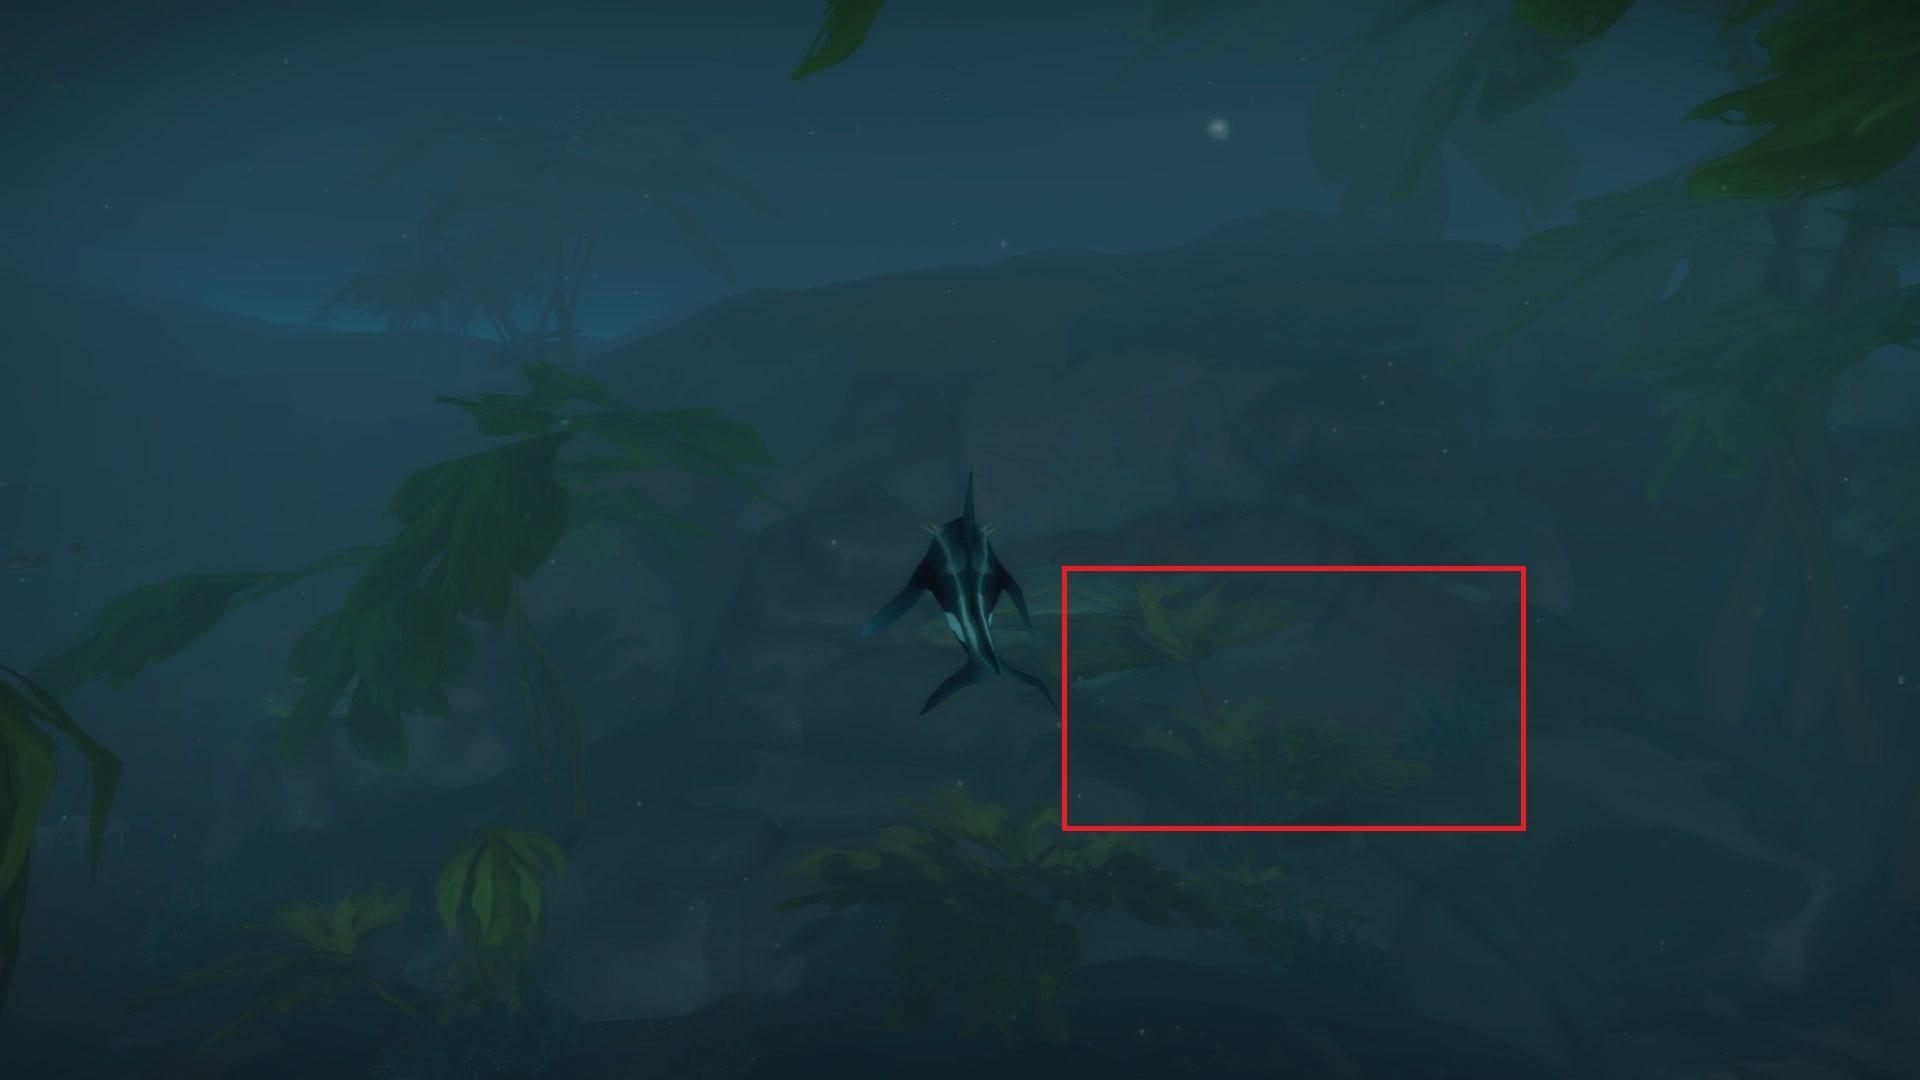 Guía para la mascota Baa'l, la cabrilla endemoniada - ¡Mascota secreta de Battle for Azeroth!